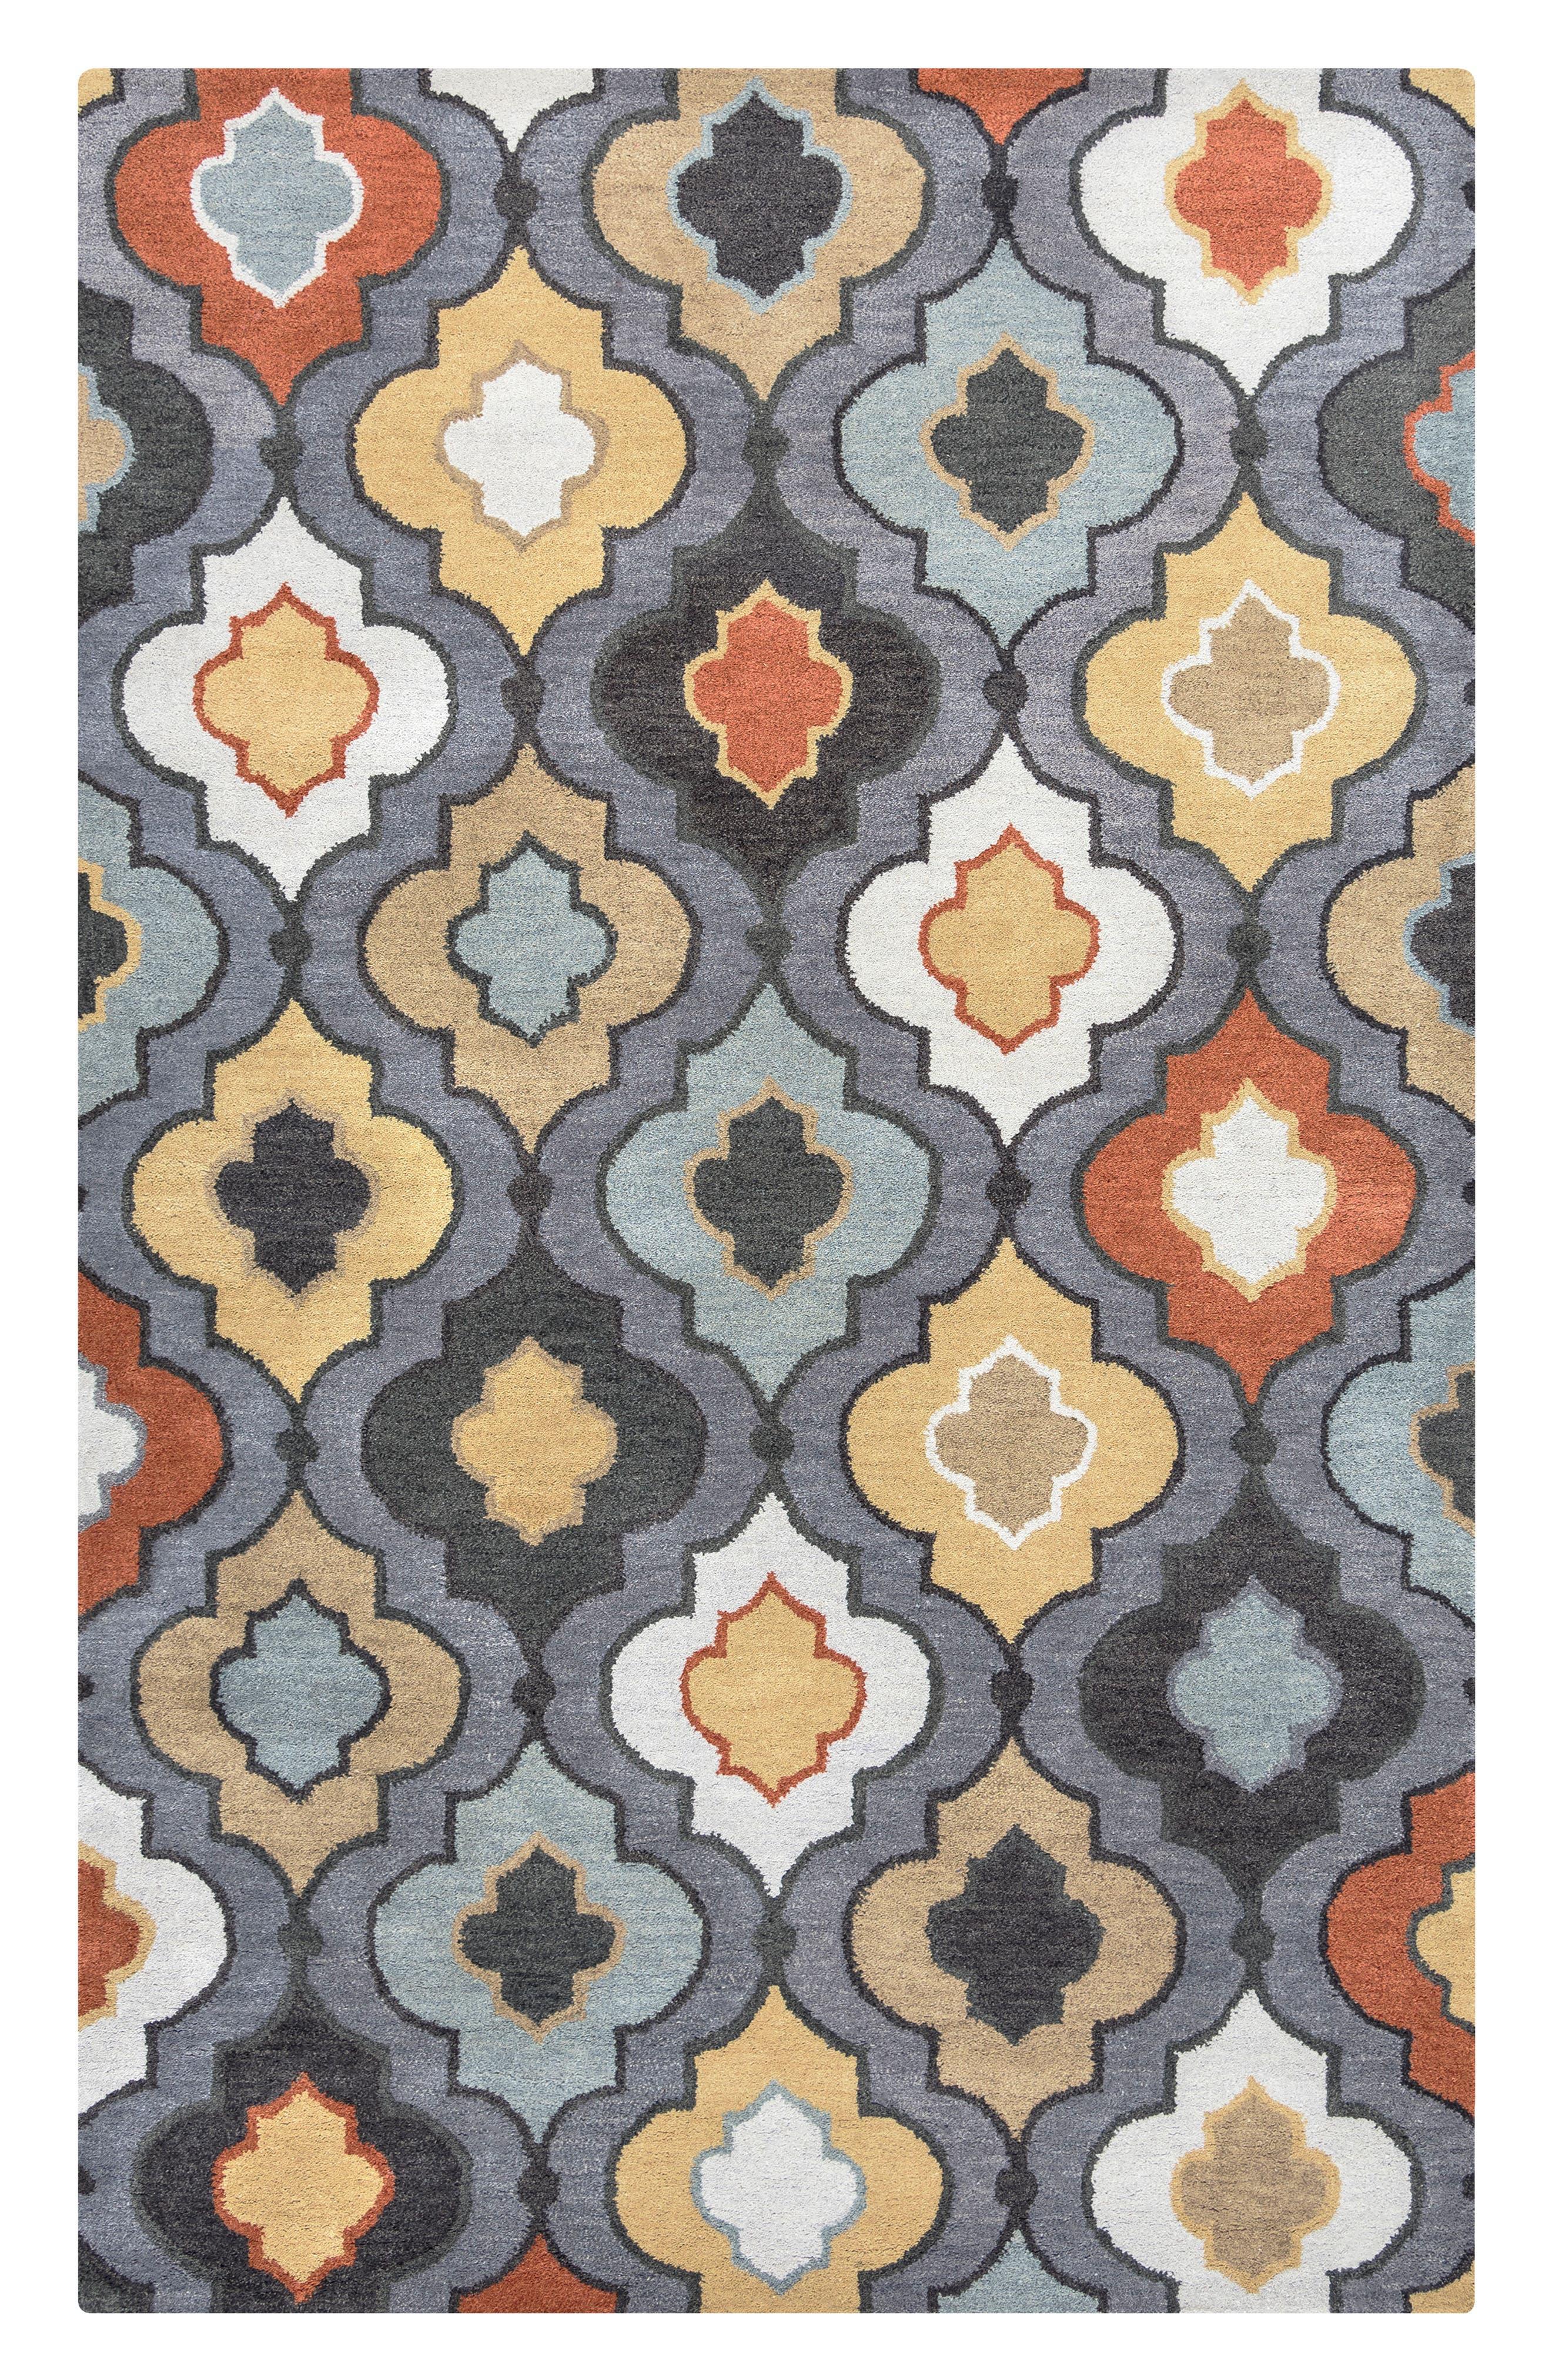 'Quatrefoil' Hand Tufted Wool Area Rug,                             Main thumbnail 1, color,                             030